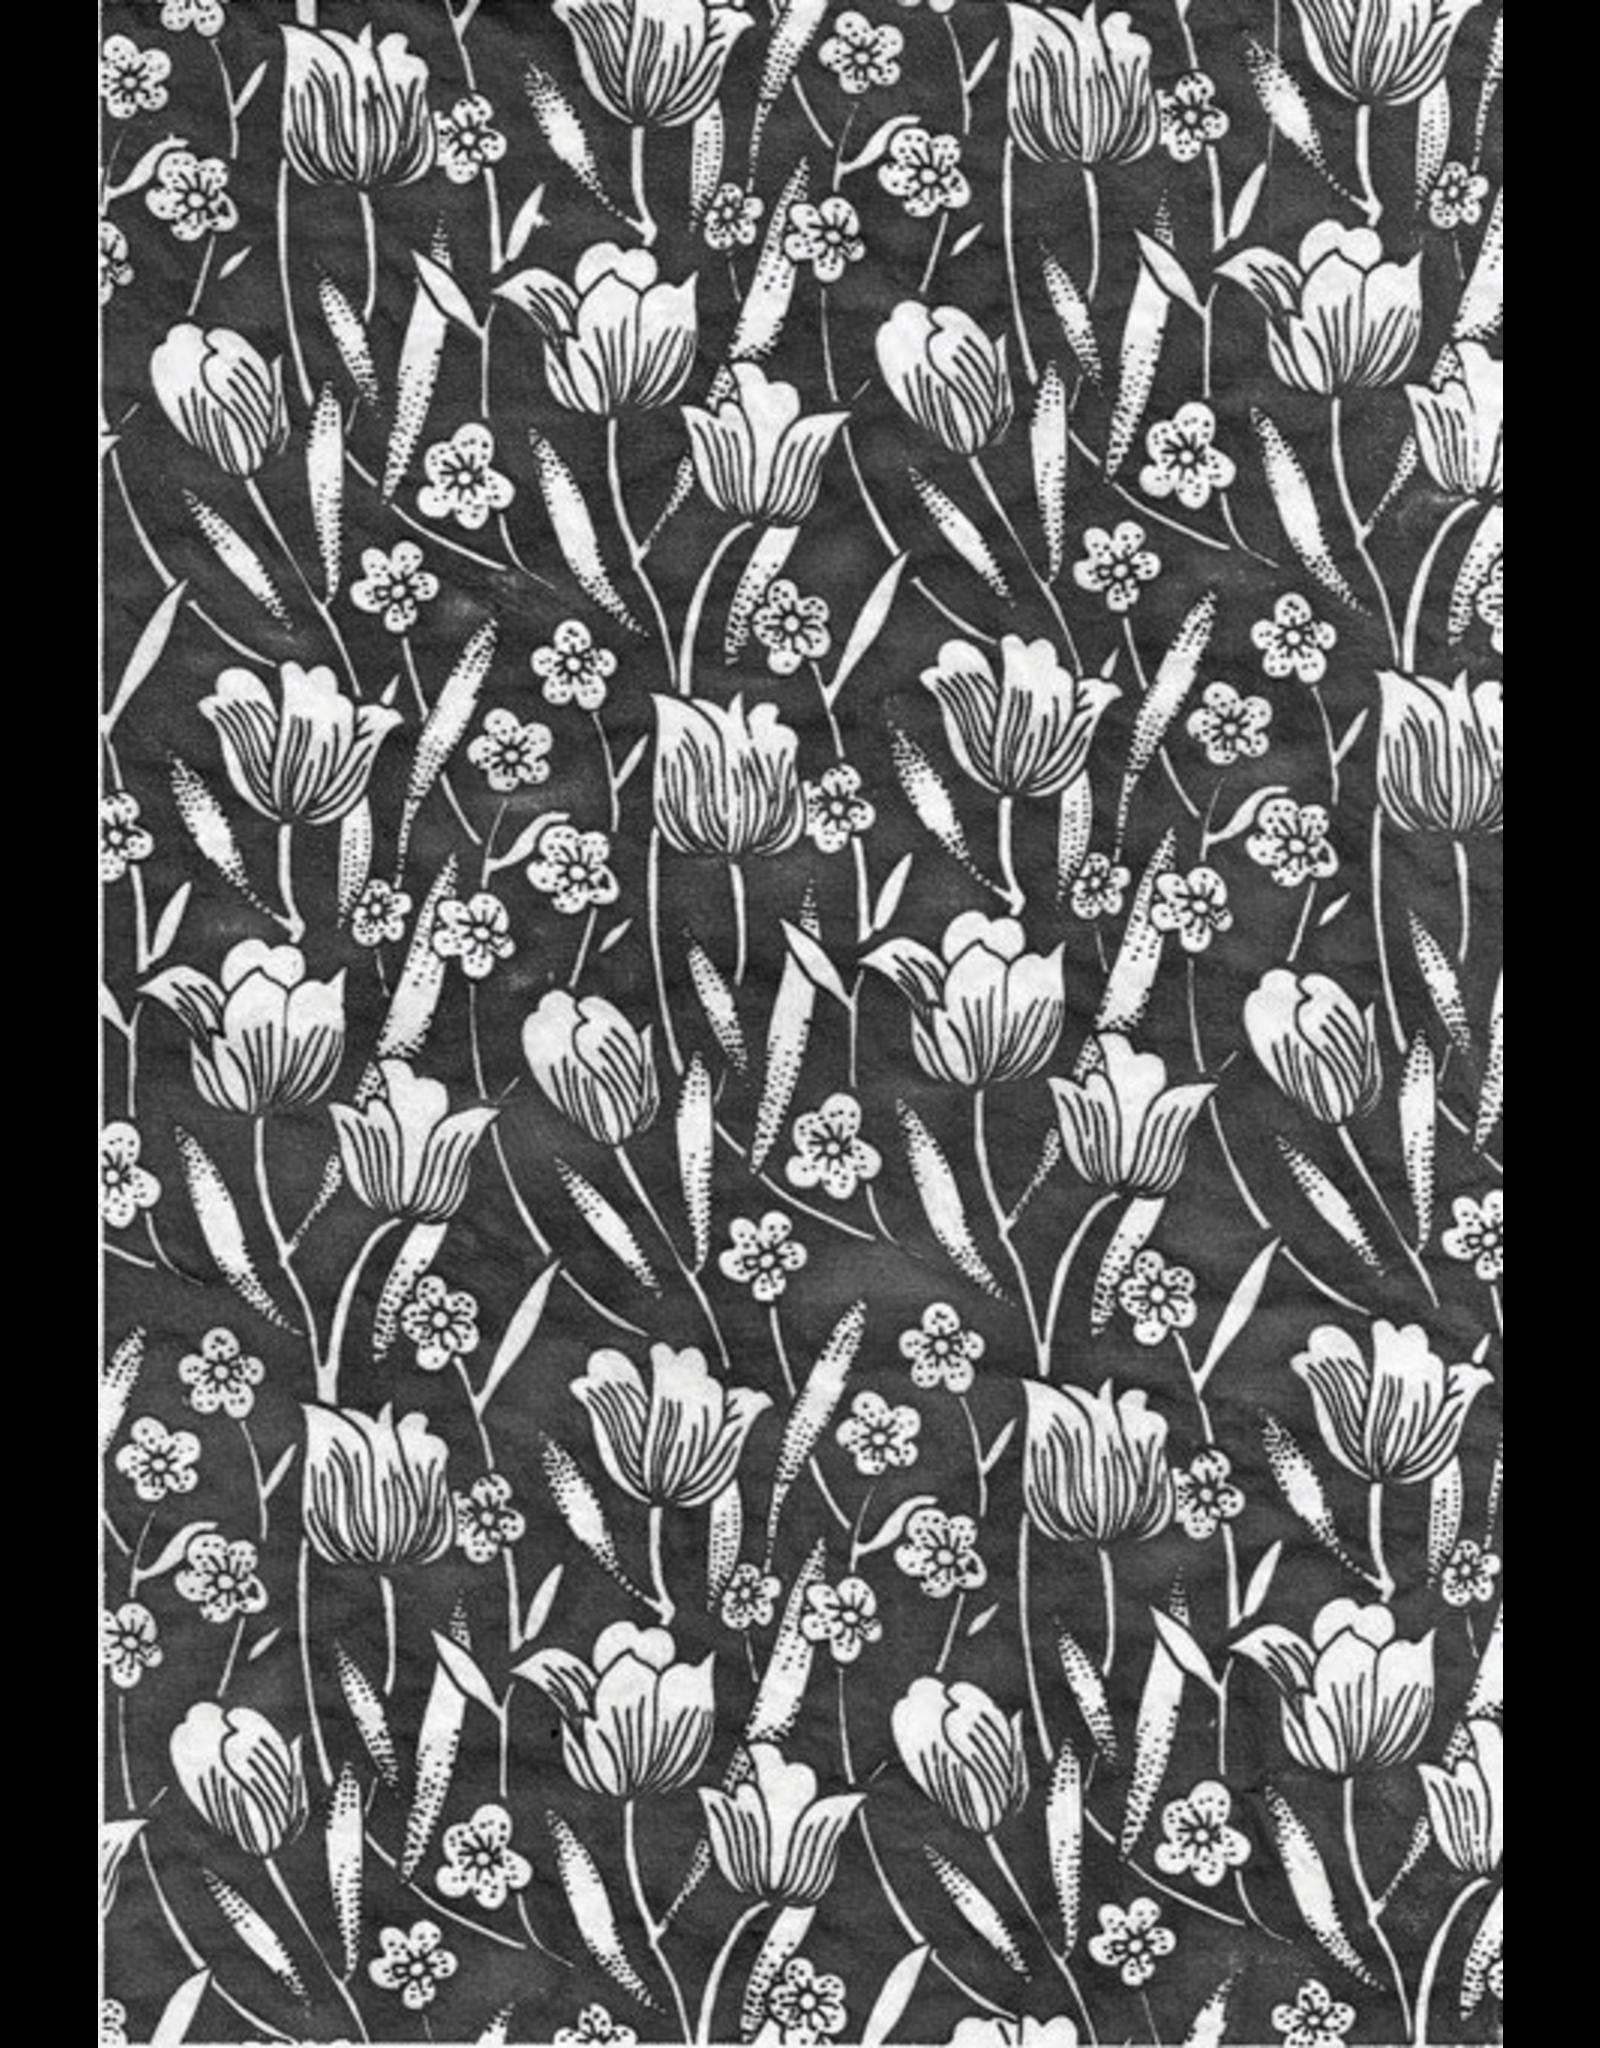 Sanbao Flower decal 08 (underglaze decal - 16cm x 22cm)